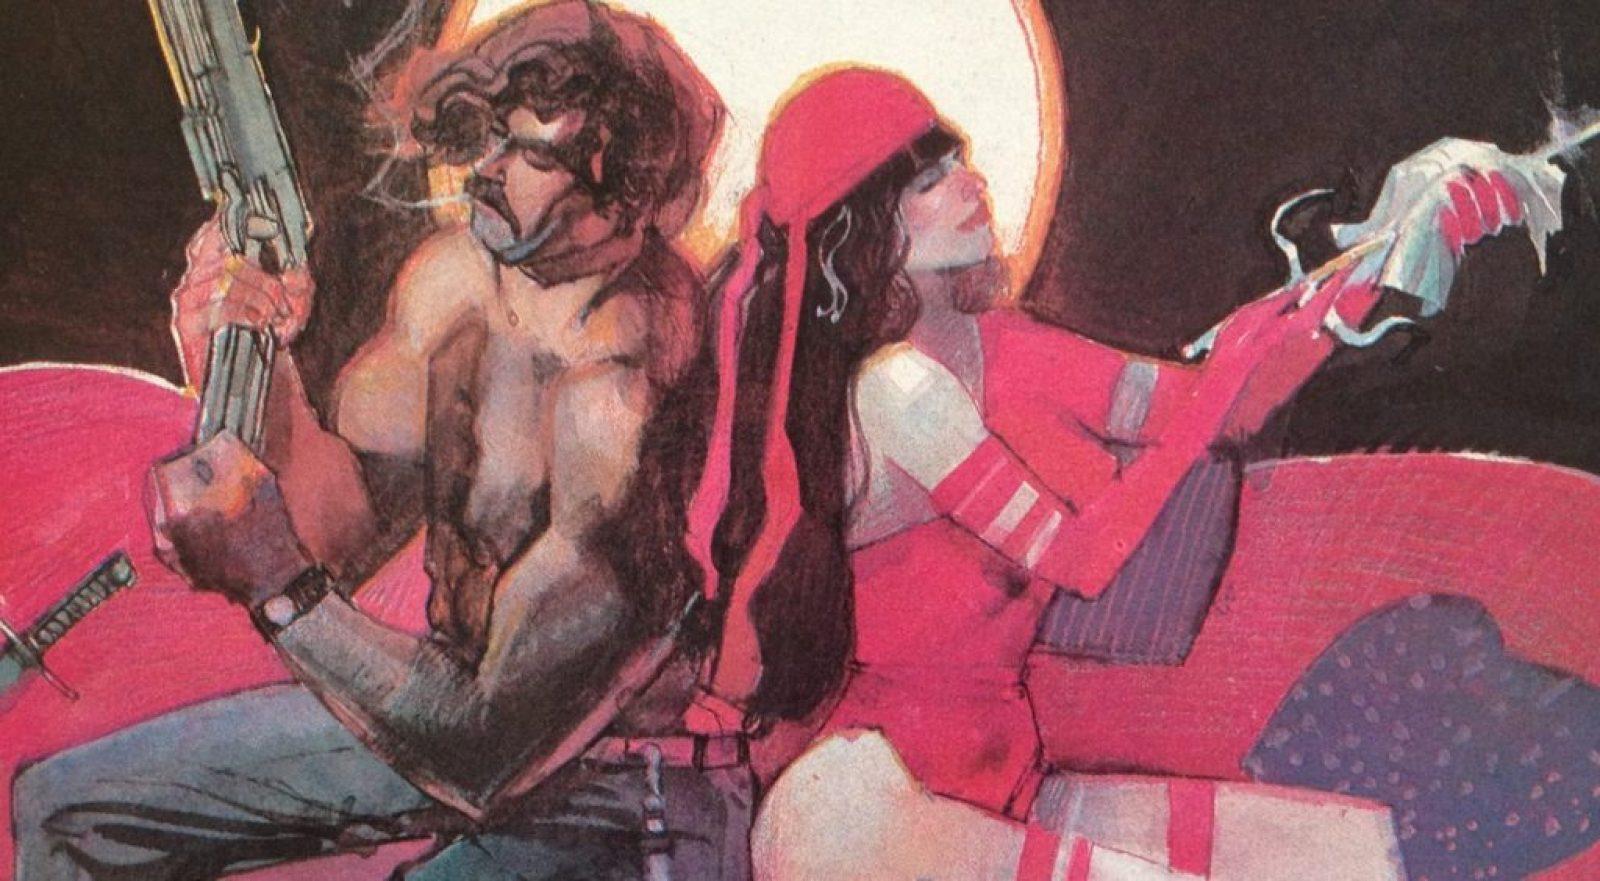 Elektra graphic novel by Frank Miller and Bill Sienkiewicz